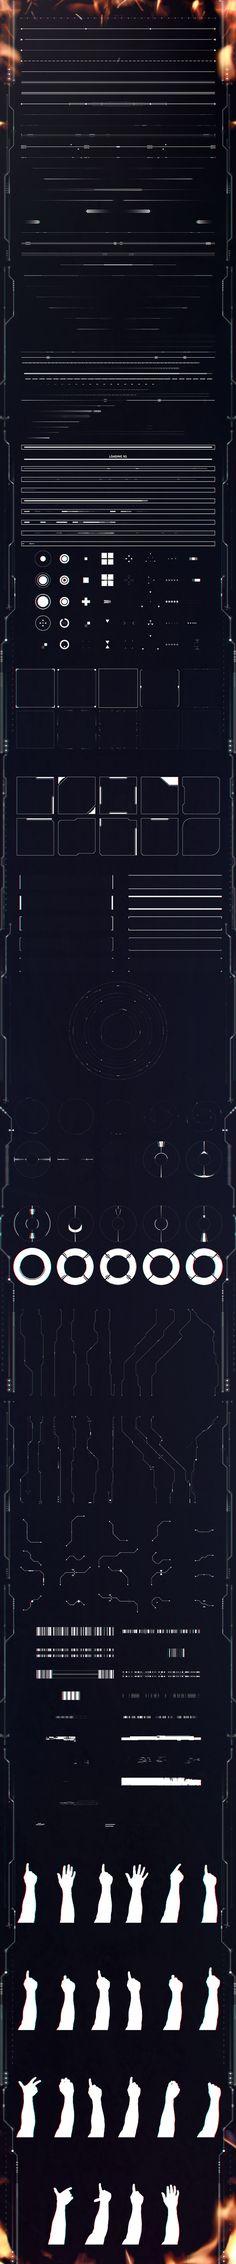 Eclipse HUD Elements on Behance